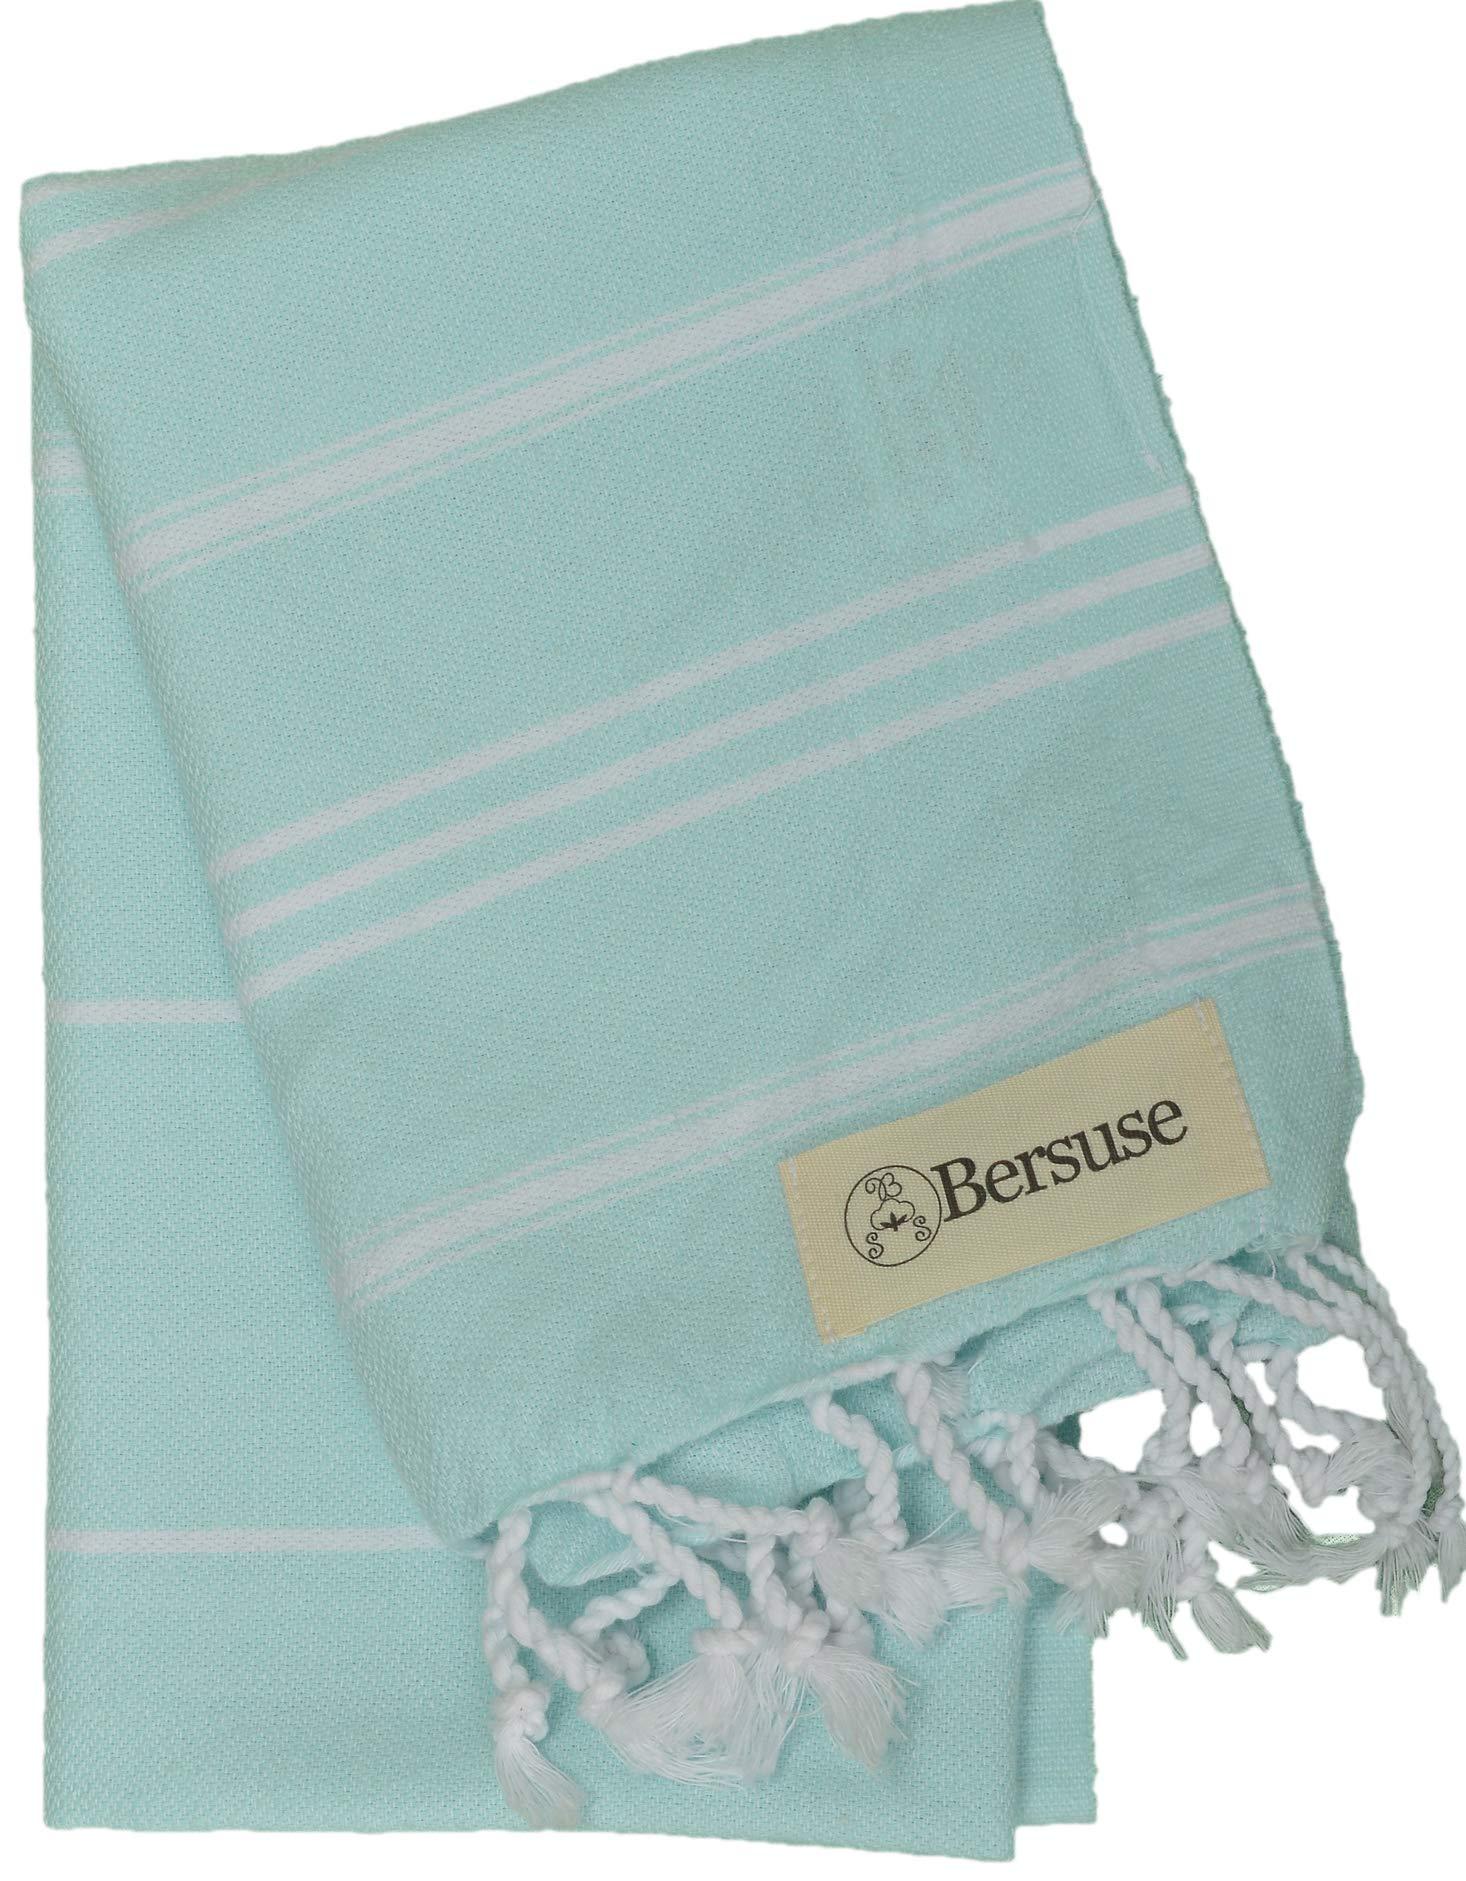 Bersuse 100% Cotton - Anatolia Hand Turkish Towel Pestemal - Baby Care Kitchen Tea Dish Washcloth - Travel Gym Head Hair Face Peshtemal - Classic Striped - 22X35 Inches, Aqua Marine